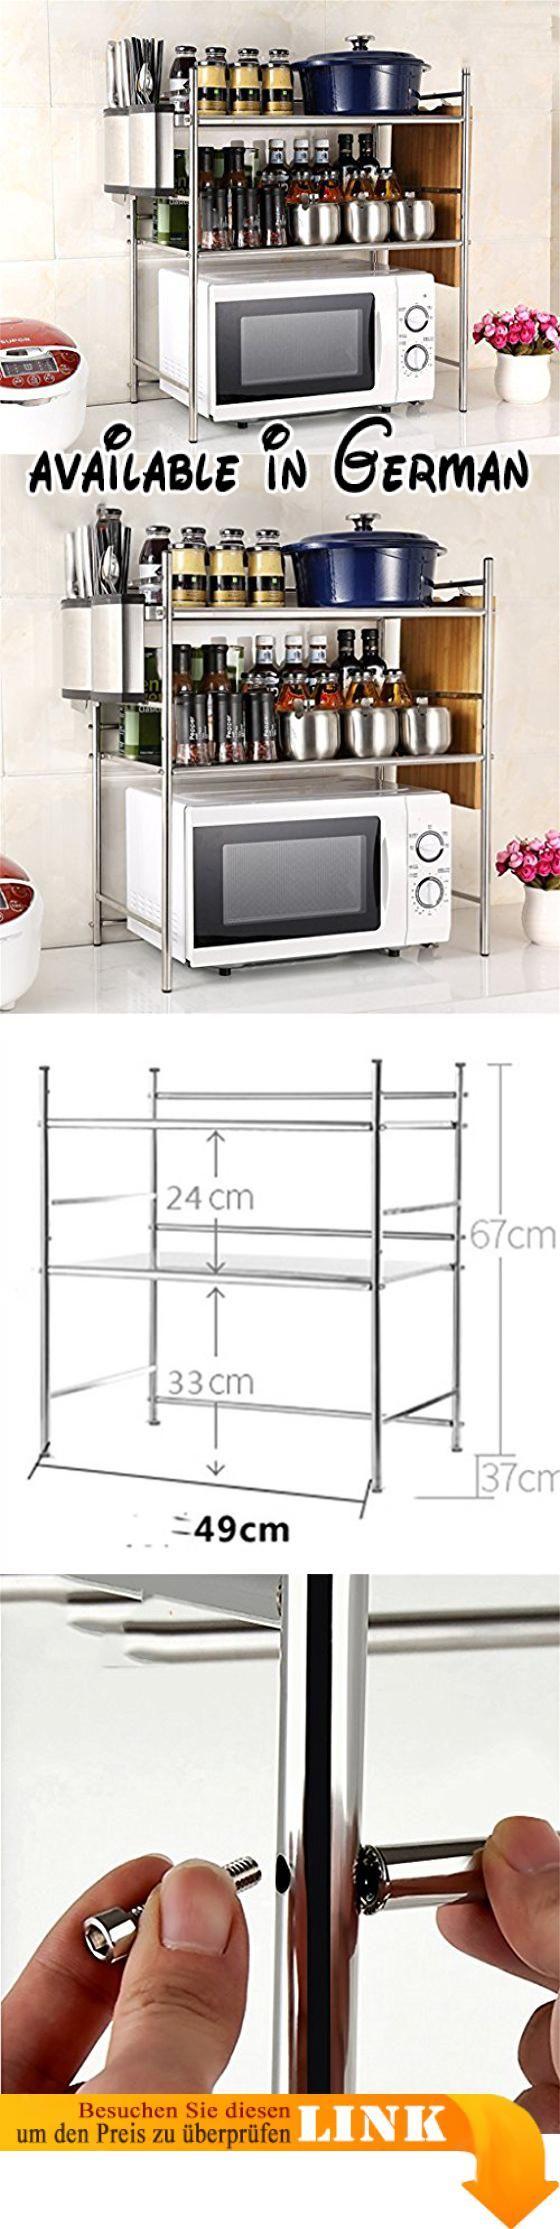 B078WR2LHB : L&Y Kitchen furniture Küche Regal Mikrowelle Ofen Rack ...